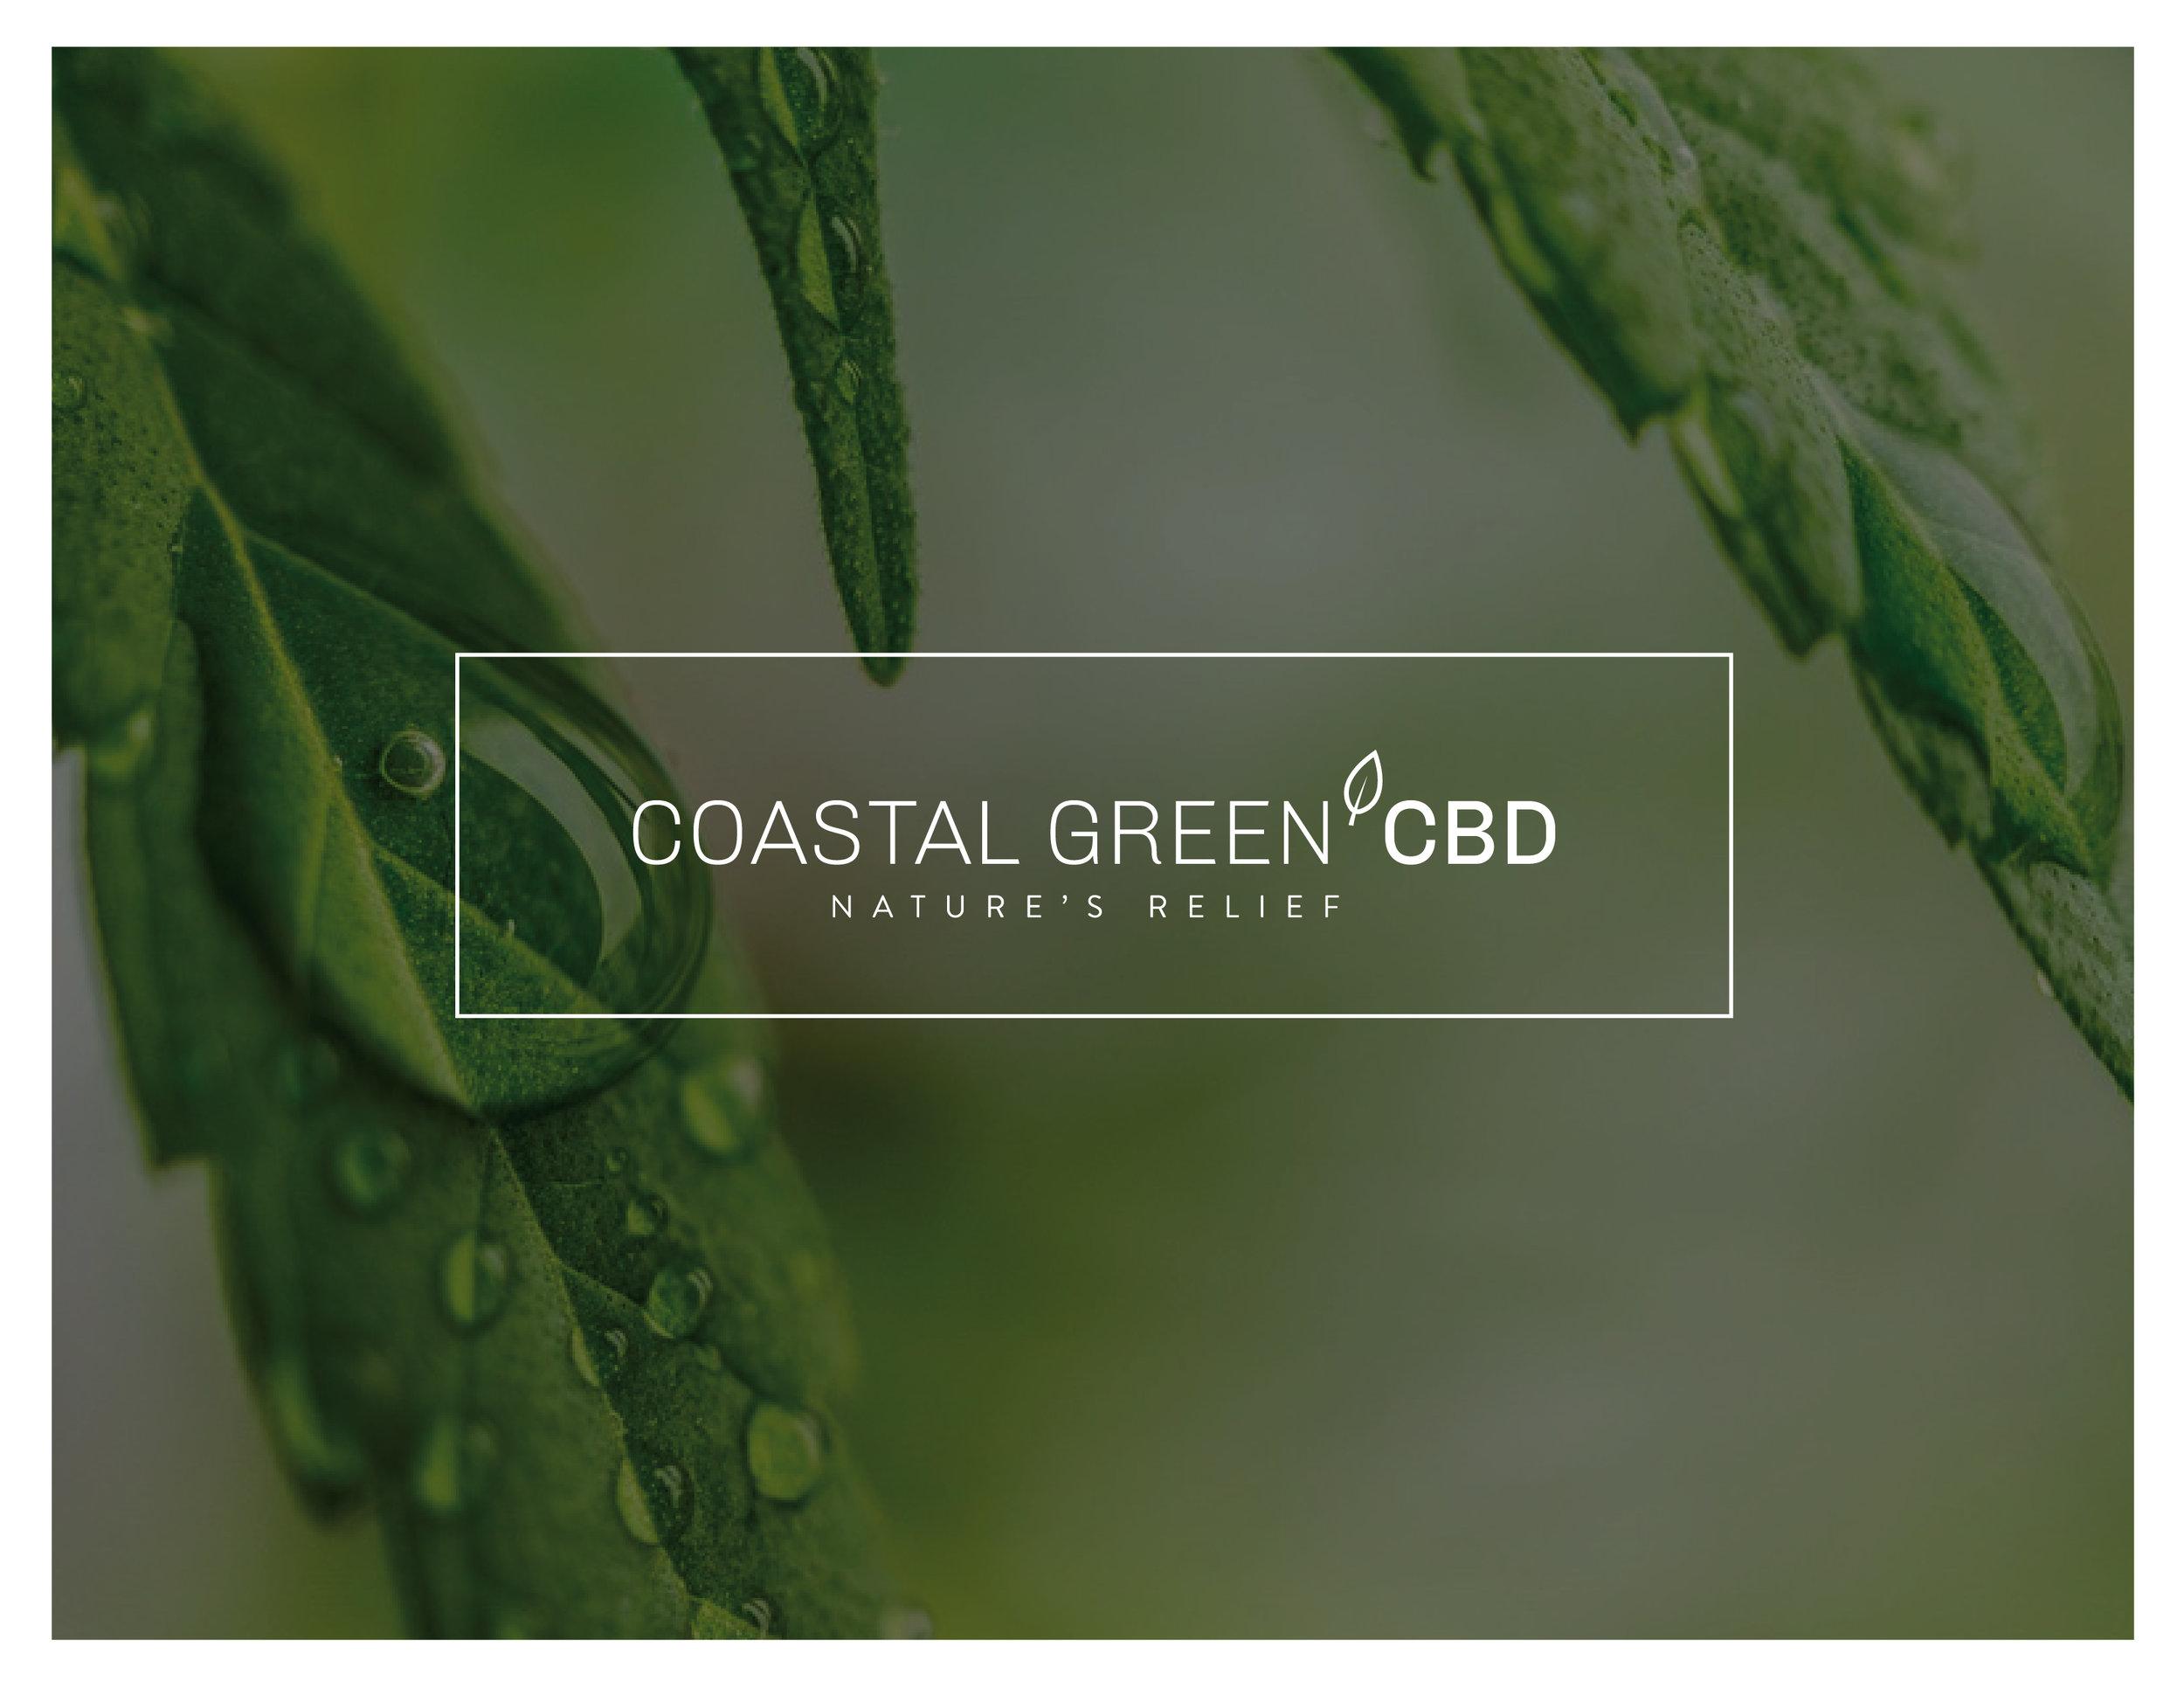 CoastalGreenCBD_BrandGuidelines-01.jpg